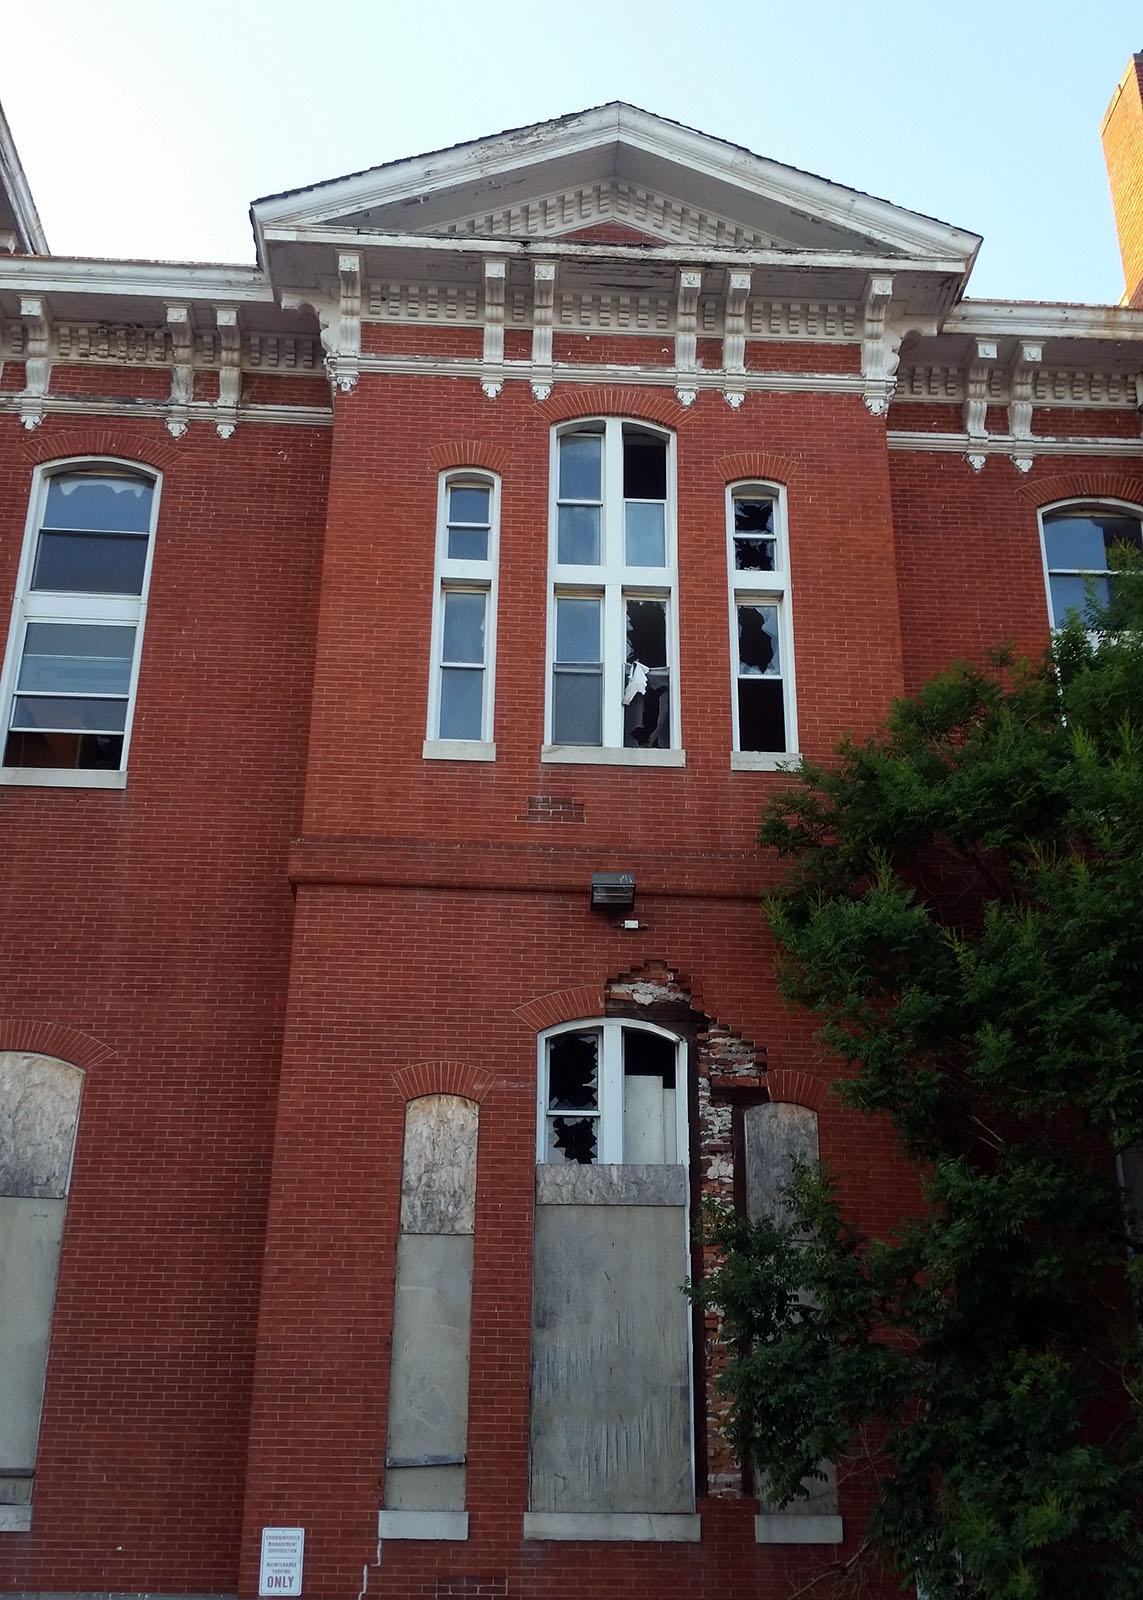 Damaged windows, Eastern Female High School. Photograph by Johns Hopkins, 2015 July 11.